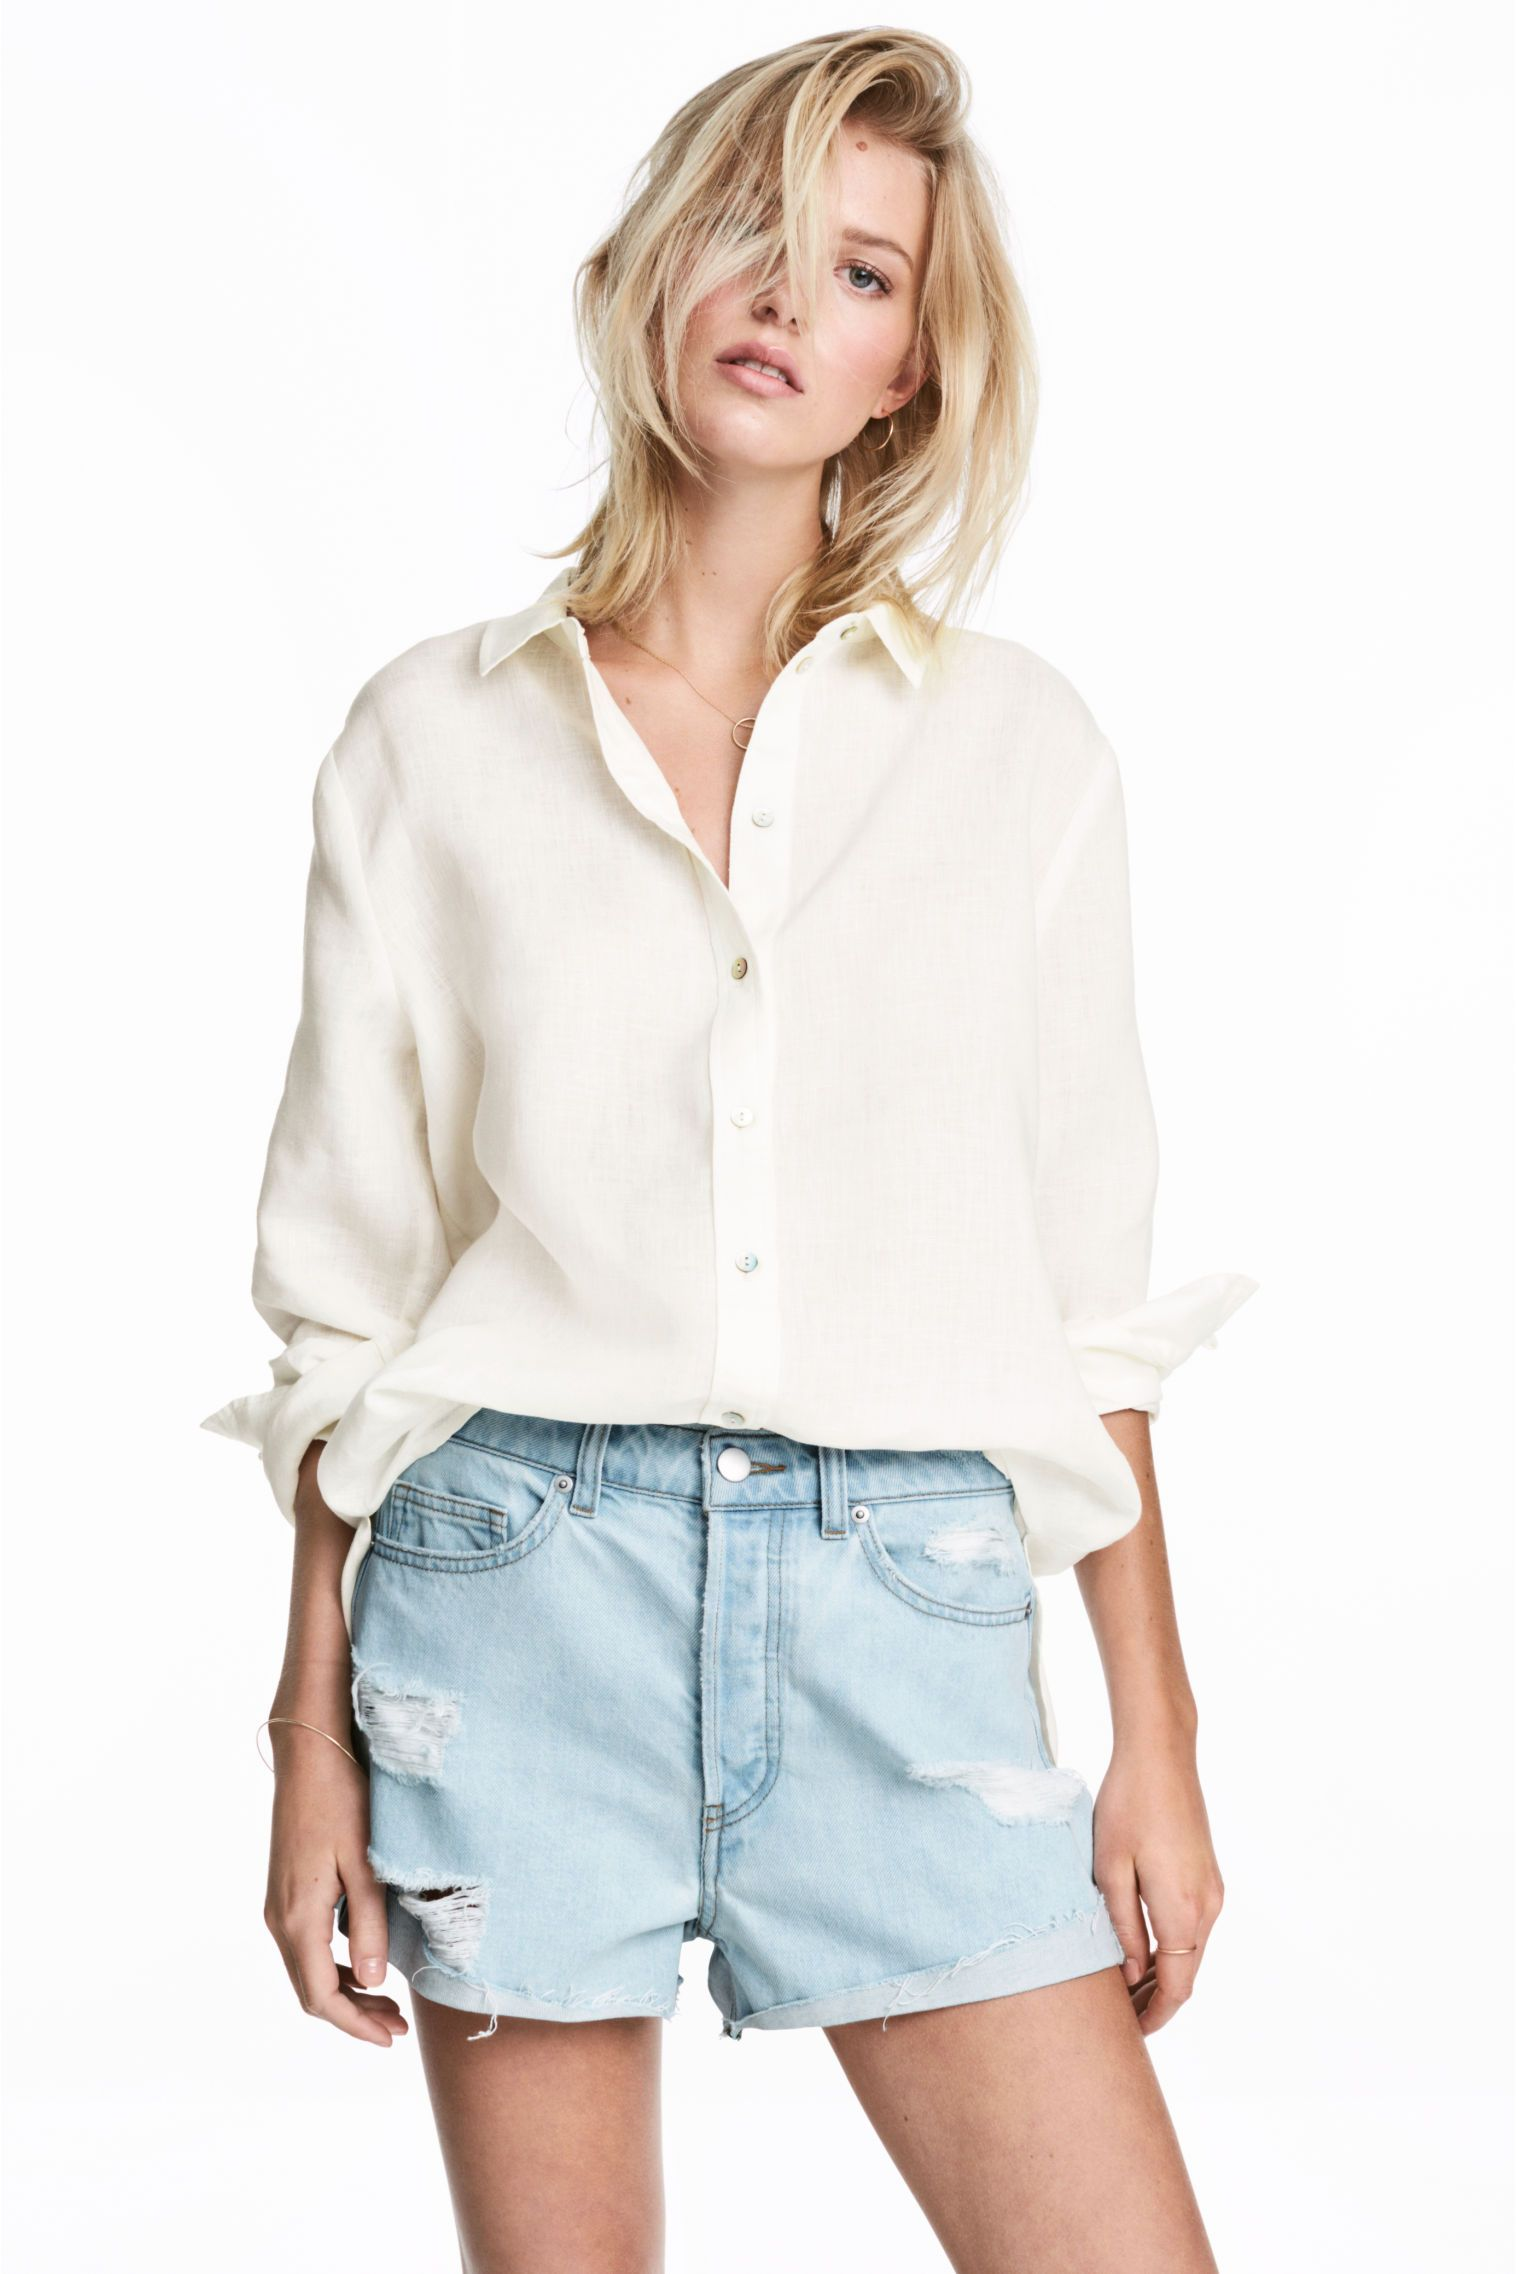 b45e9f0502a14 Ladies Linen Shirts Blouses - BCD Tofu House